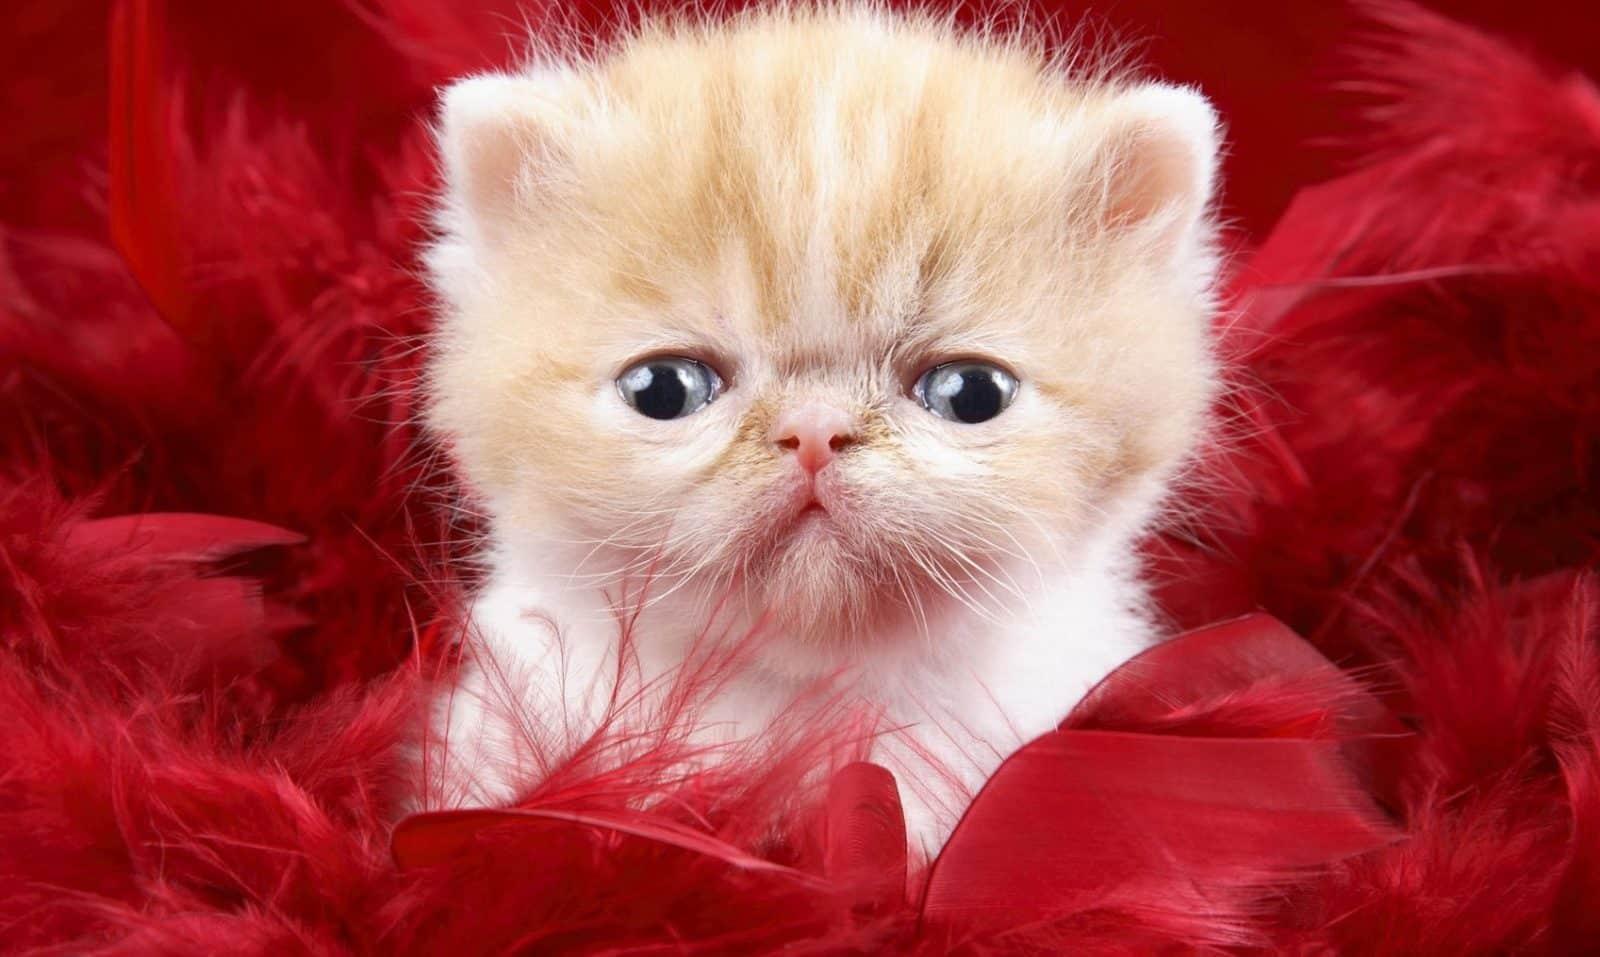 صور قطط حزينه